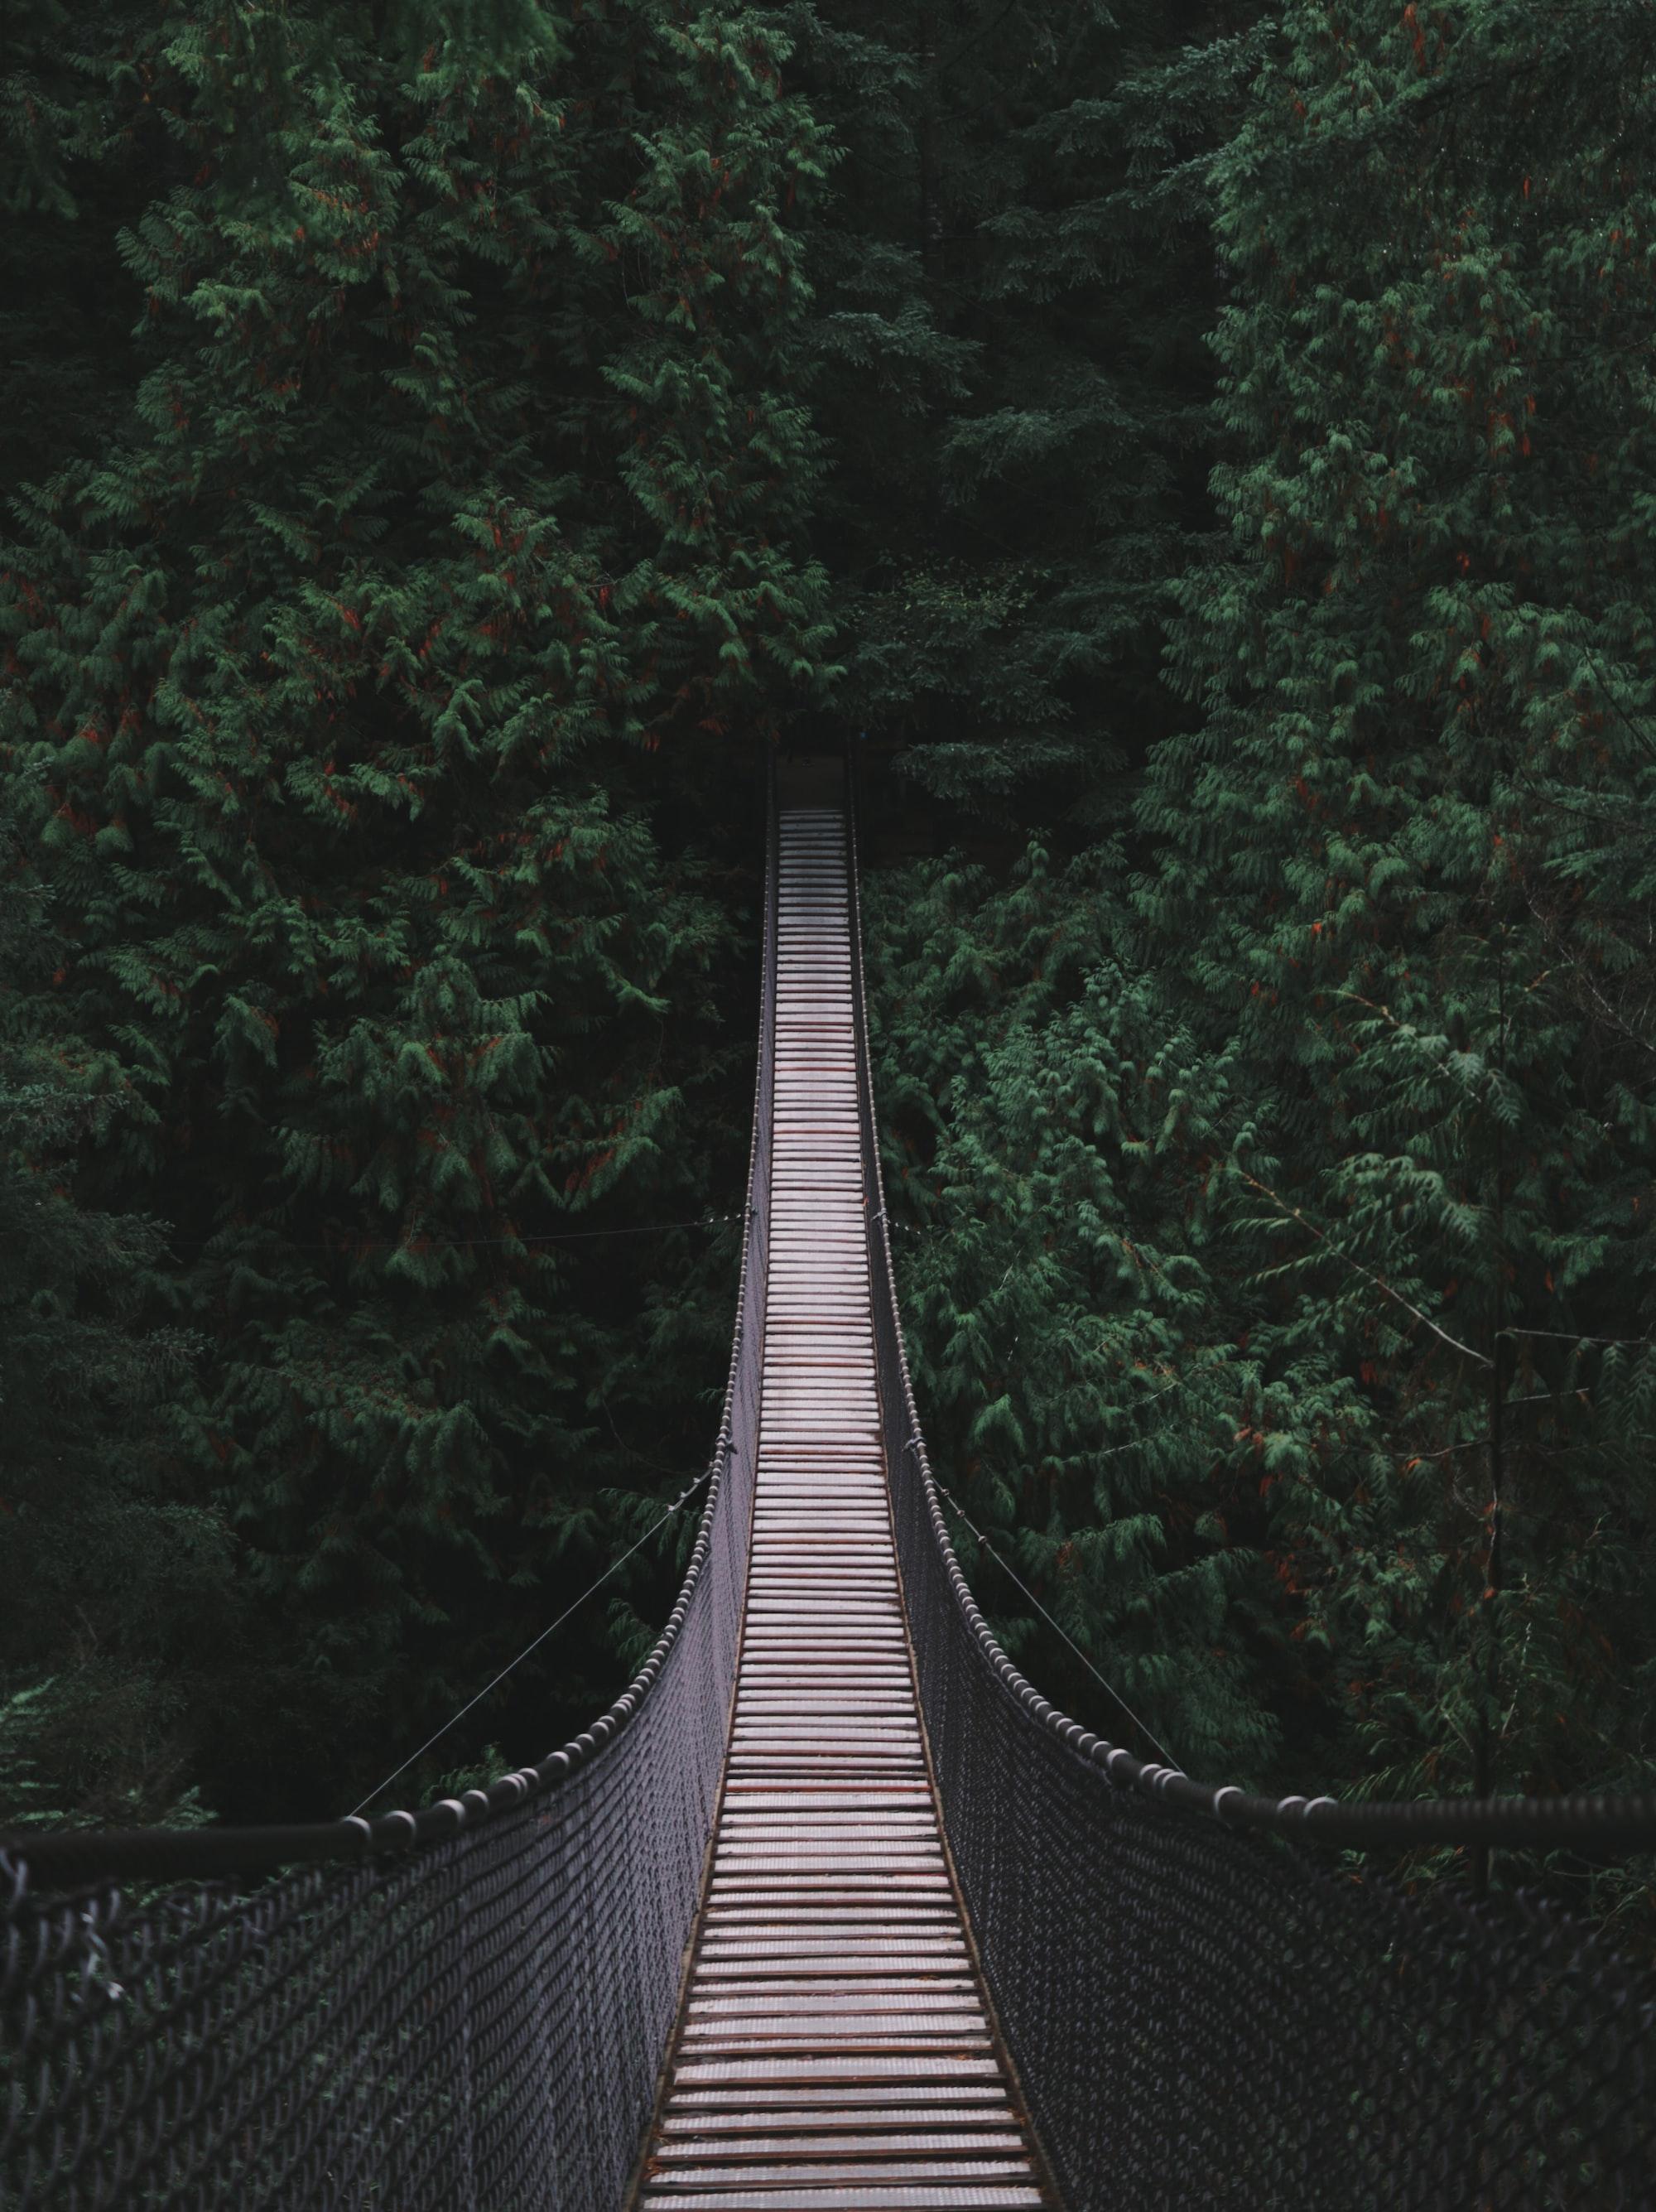 Bridging the Gap (Virtually)